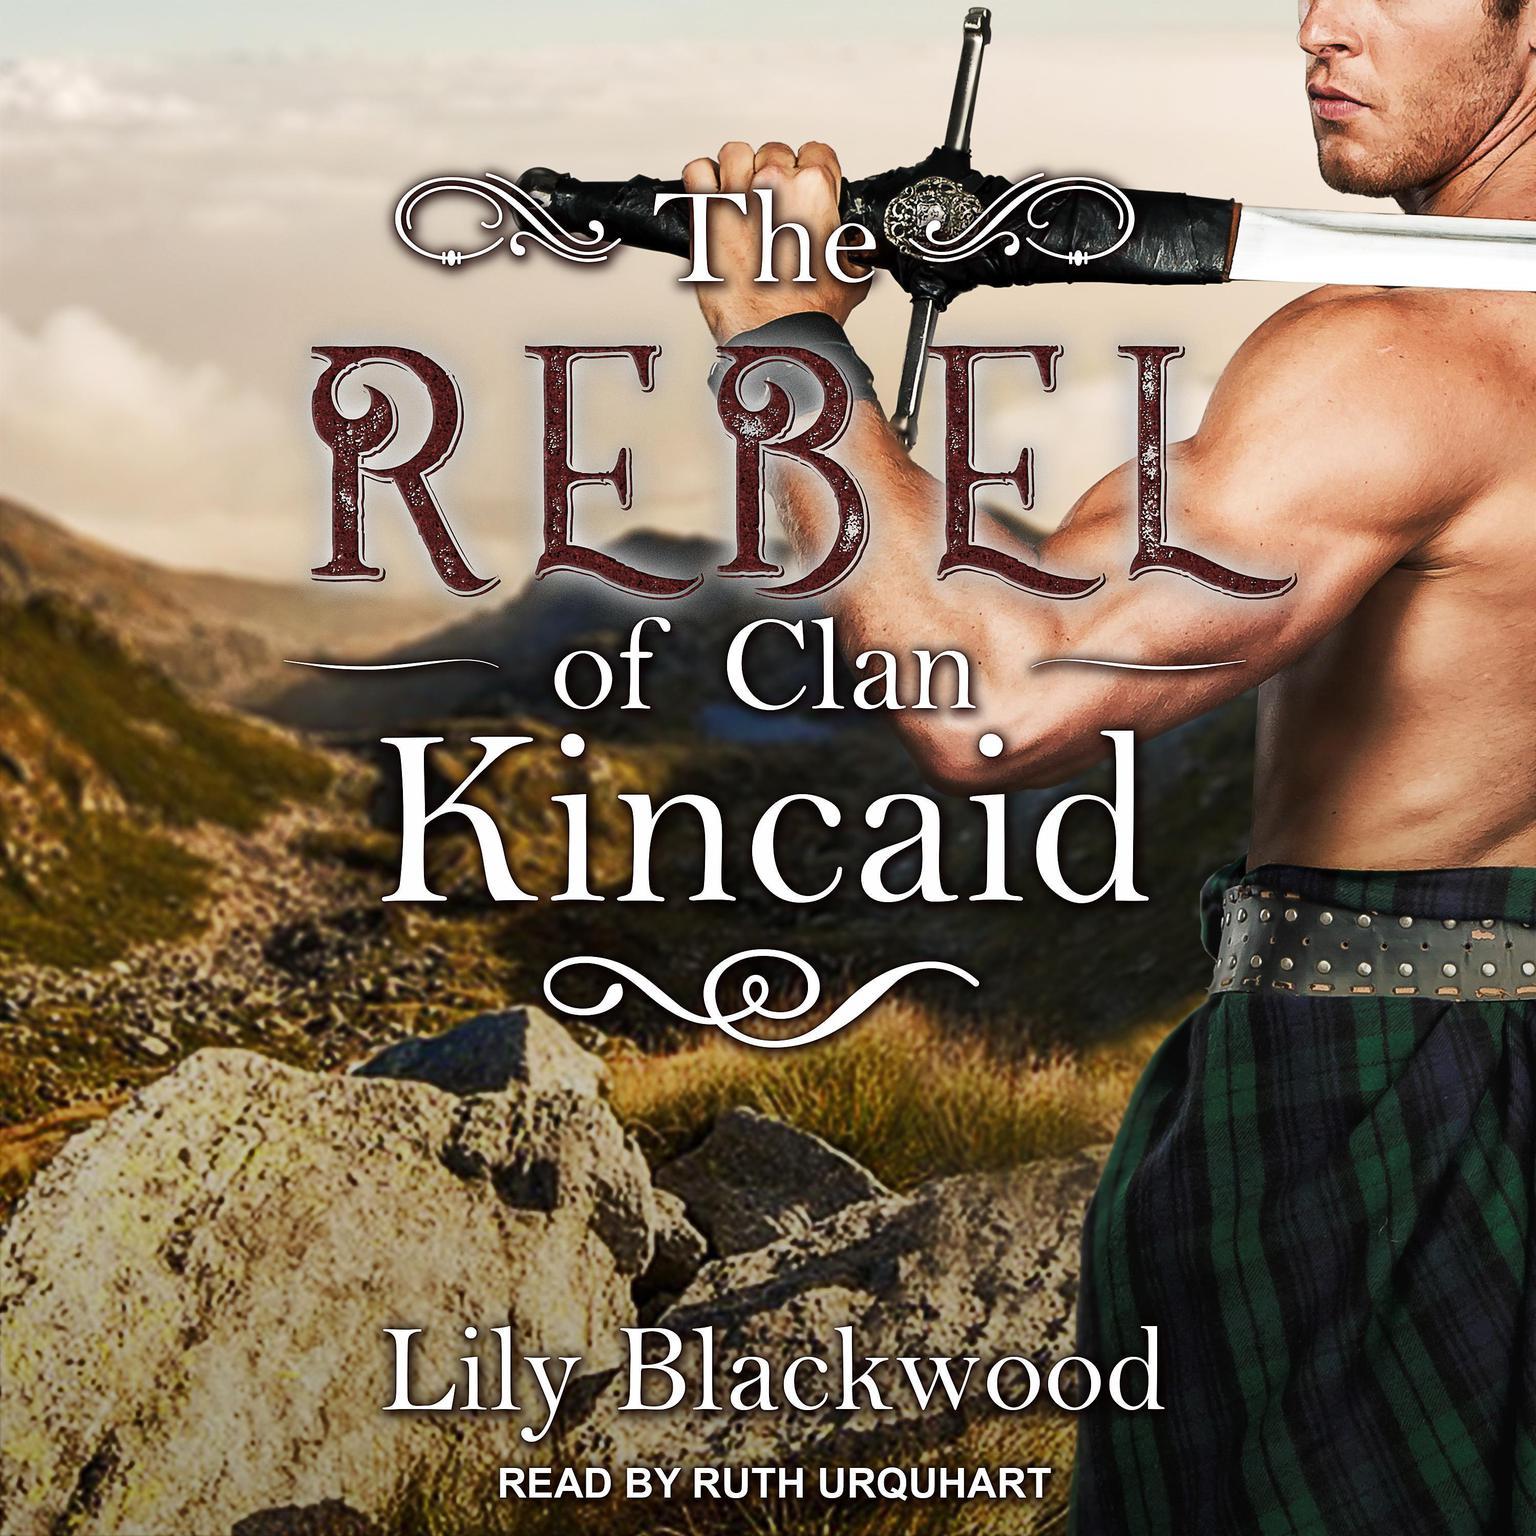 Printable The Rebel of Clan Kincaid Audiobook Cover Art